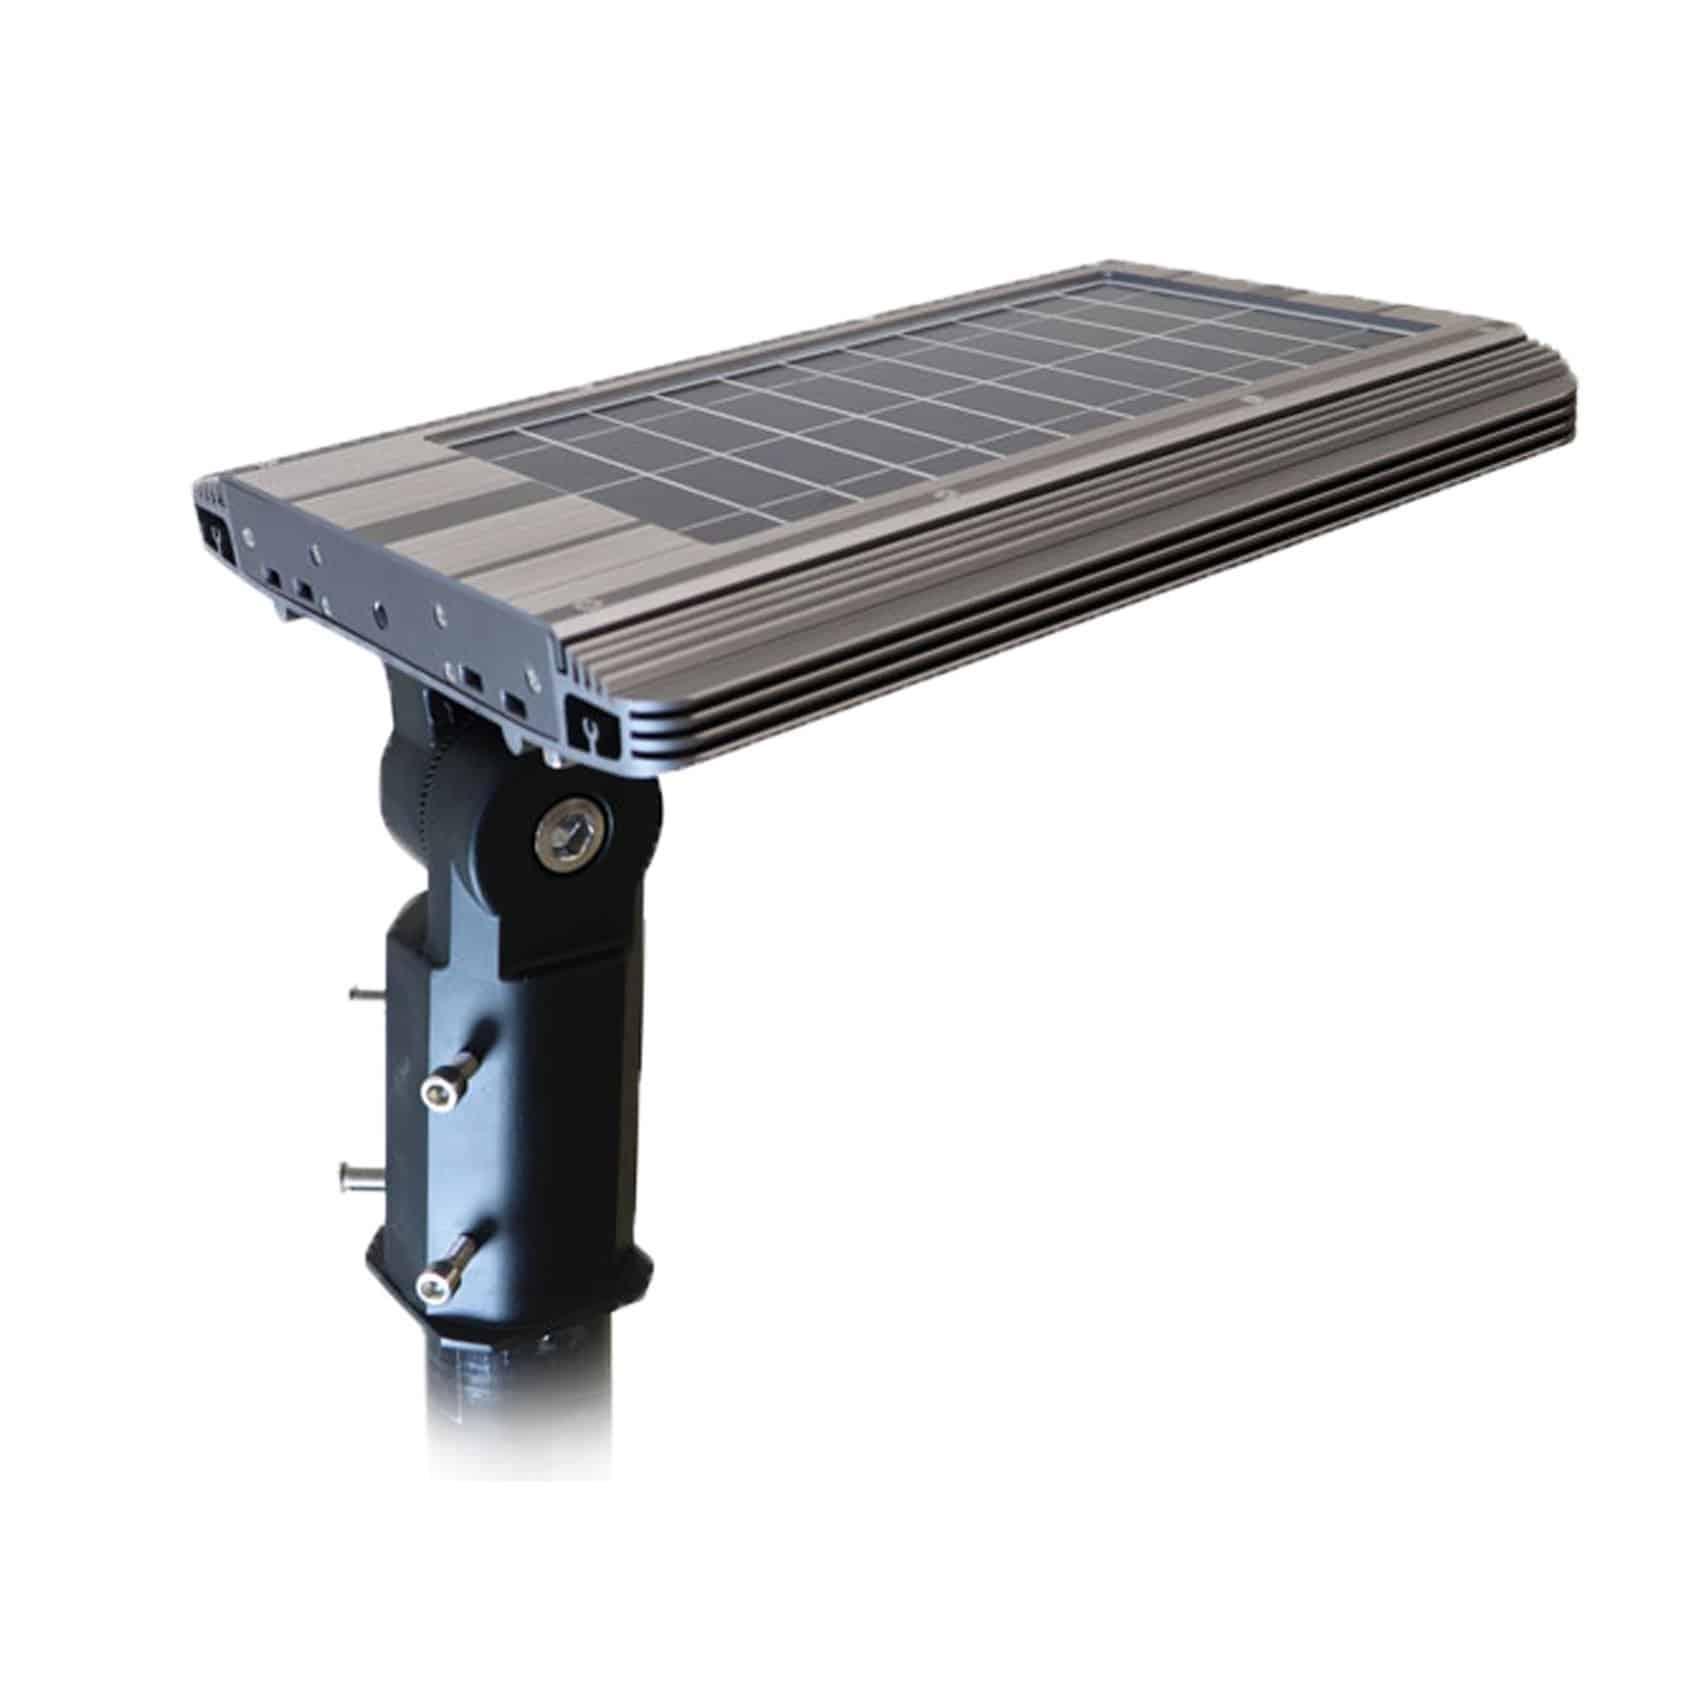 gfs-7 solar path light